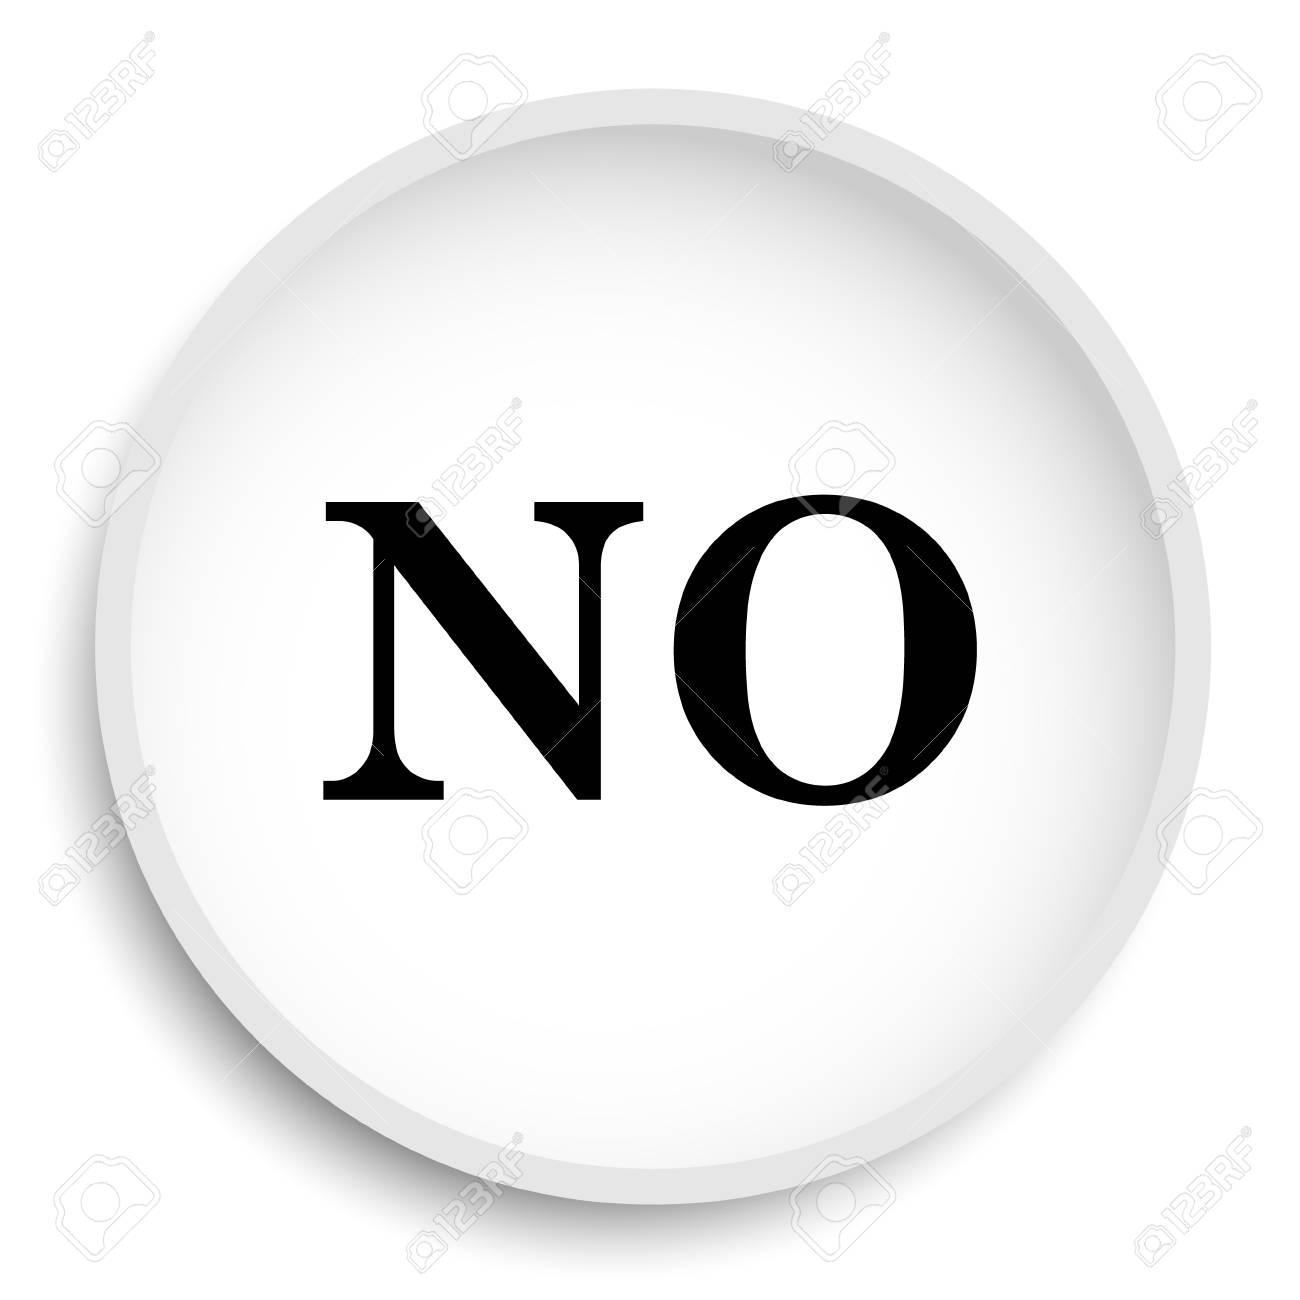 No icon  No website button on white background